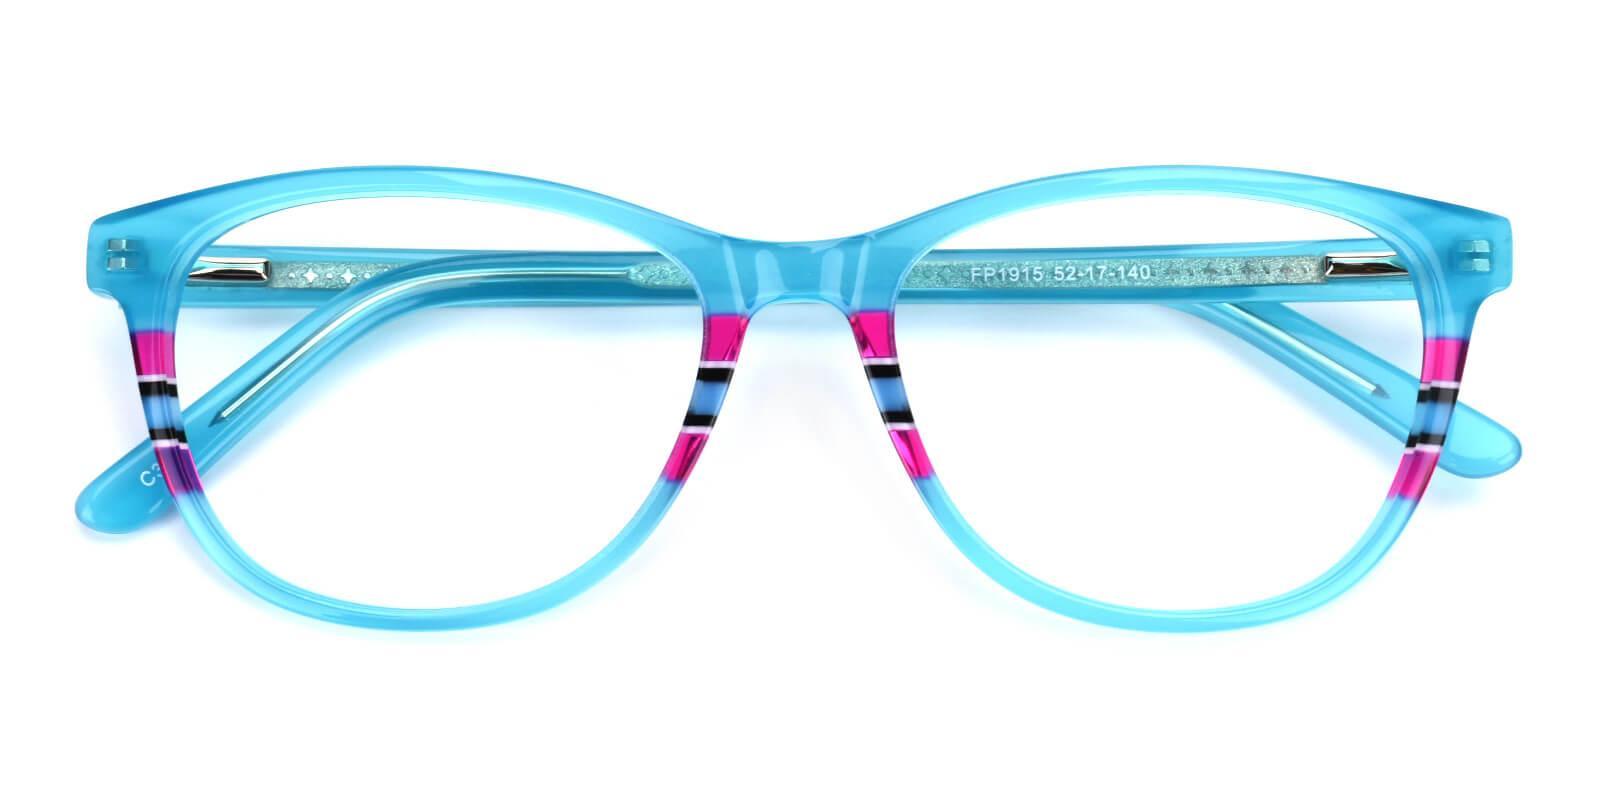 Faithely-Blue-Square-Acetate-Eyeglasses-detail